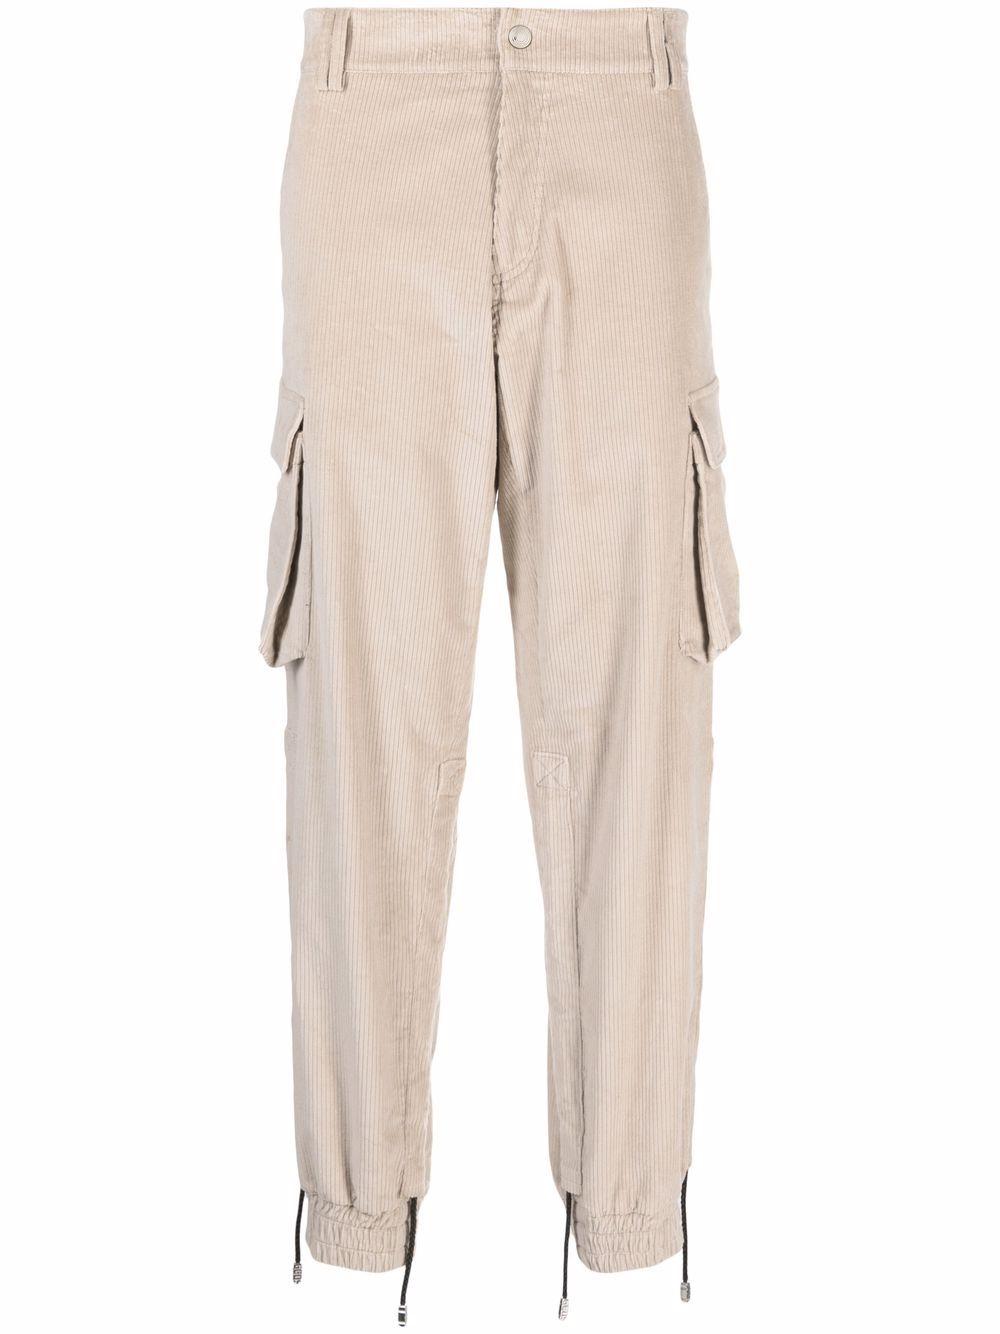 pantaloni cargo uomo beige in cotone GCDS   Pantaloni   FW22M03050213